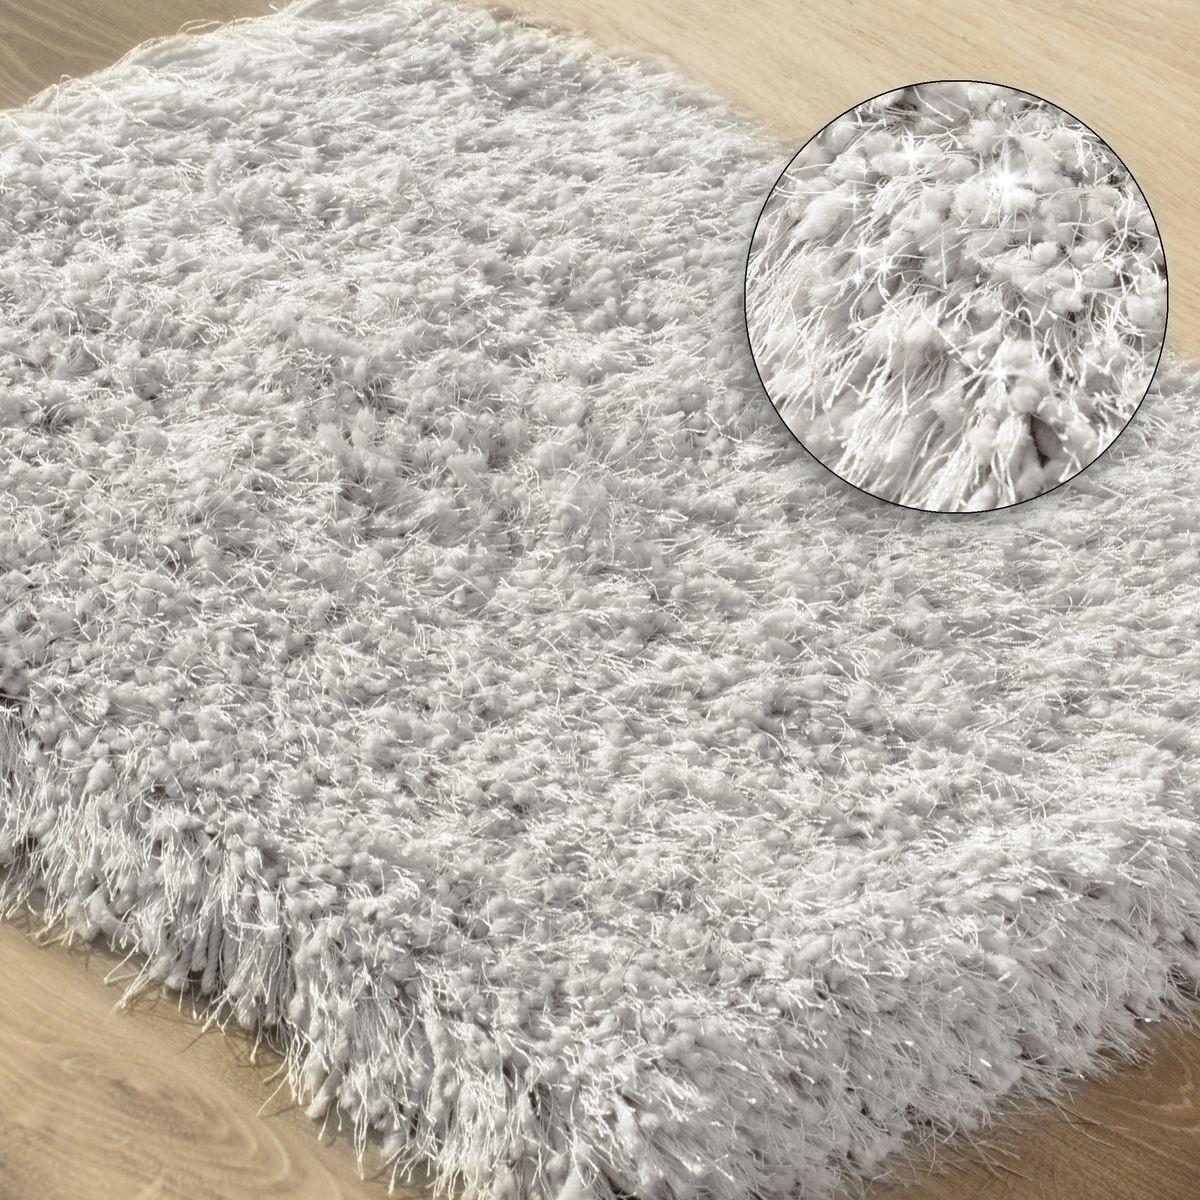 DomTextilu Mäkký béžový kúpeľňový koberec 50 x 70 cm Šírka: 50 cm | Dĺžka: 70 cm 44468-208045